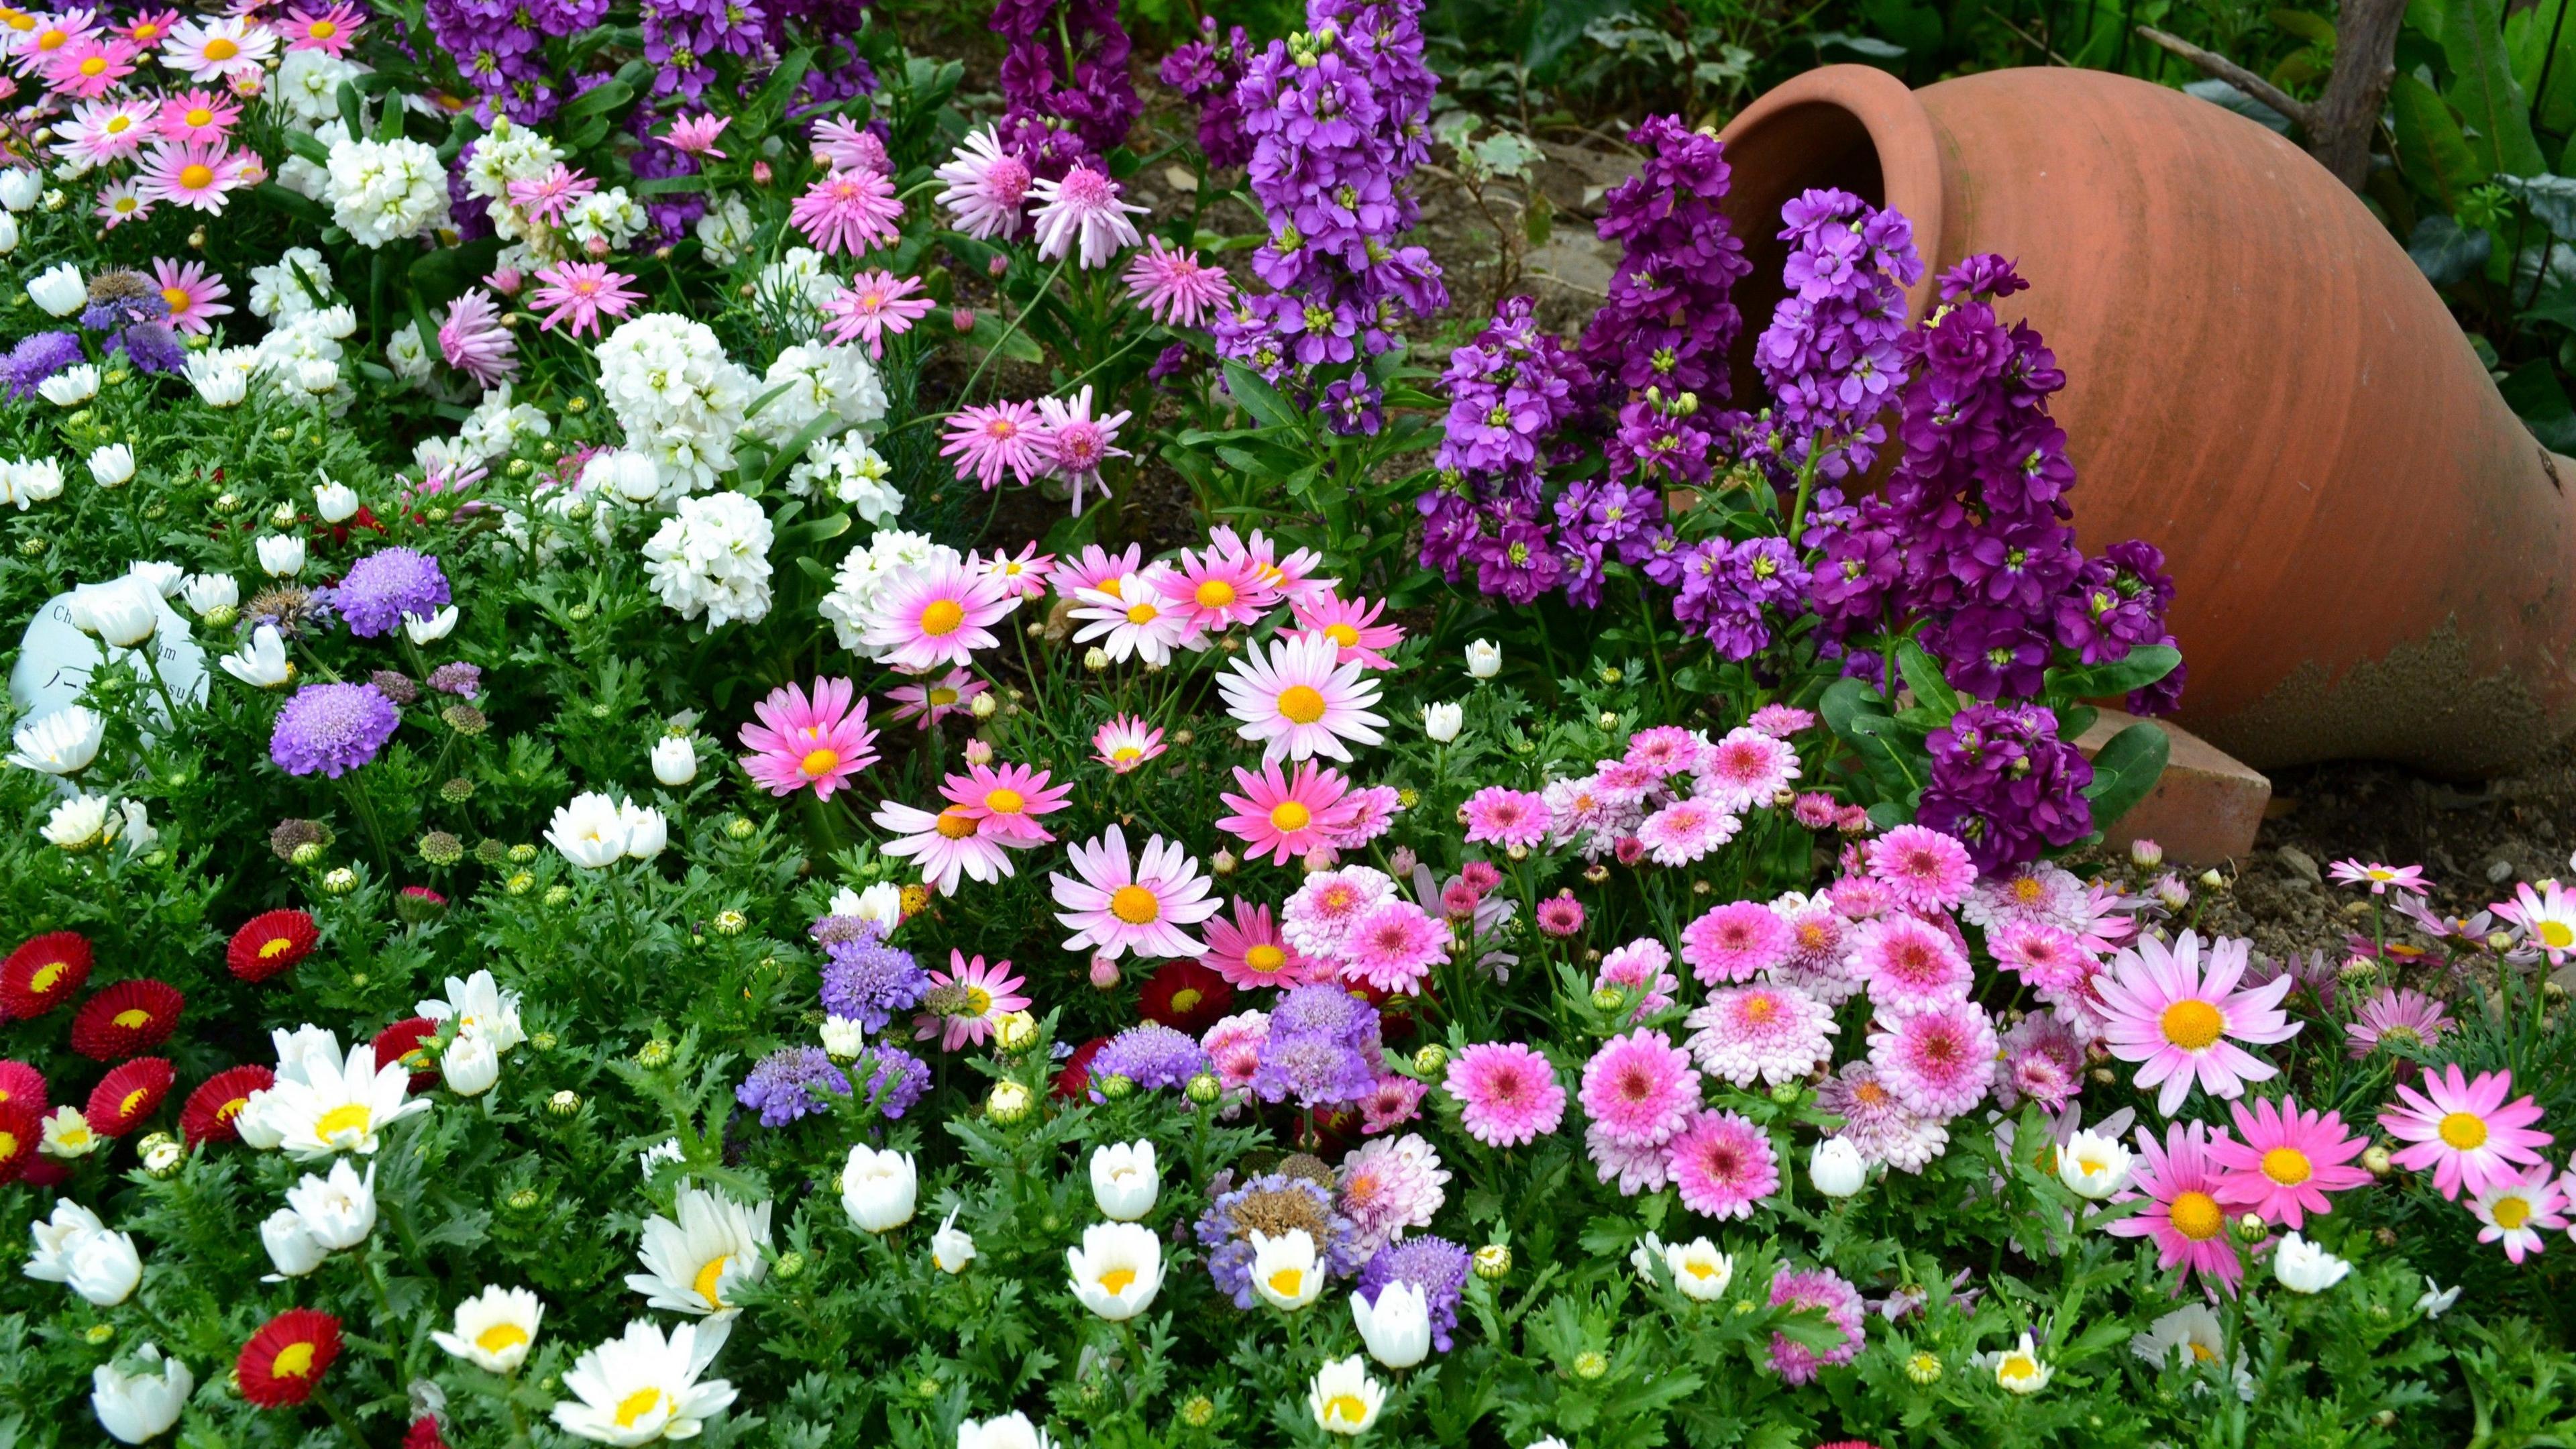 flowers flowerbed different much greens vase garden 4k 1540064738 - flowers, flowerbed, different, much, greens, vase, garden 4k - Flowers, flowerbed, Different